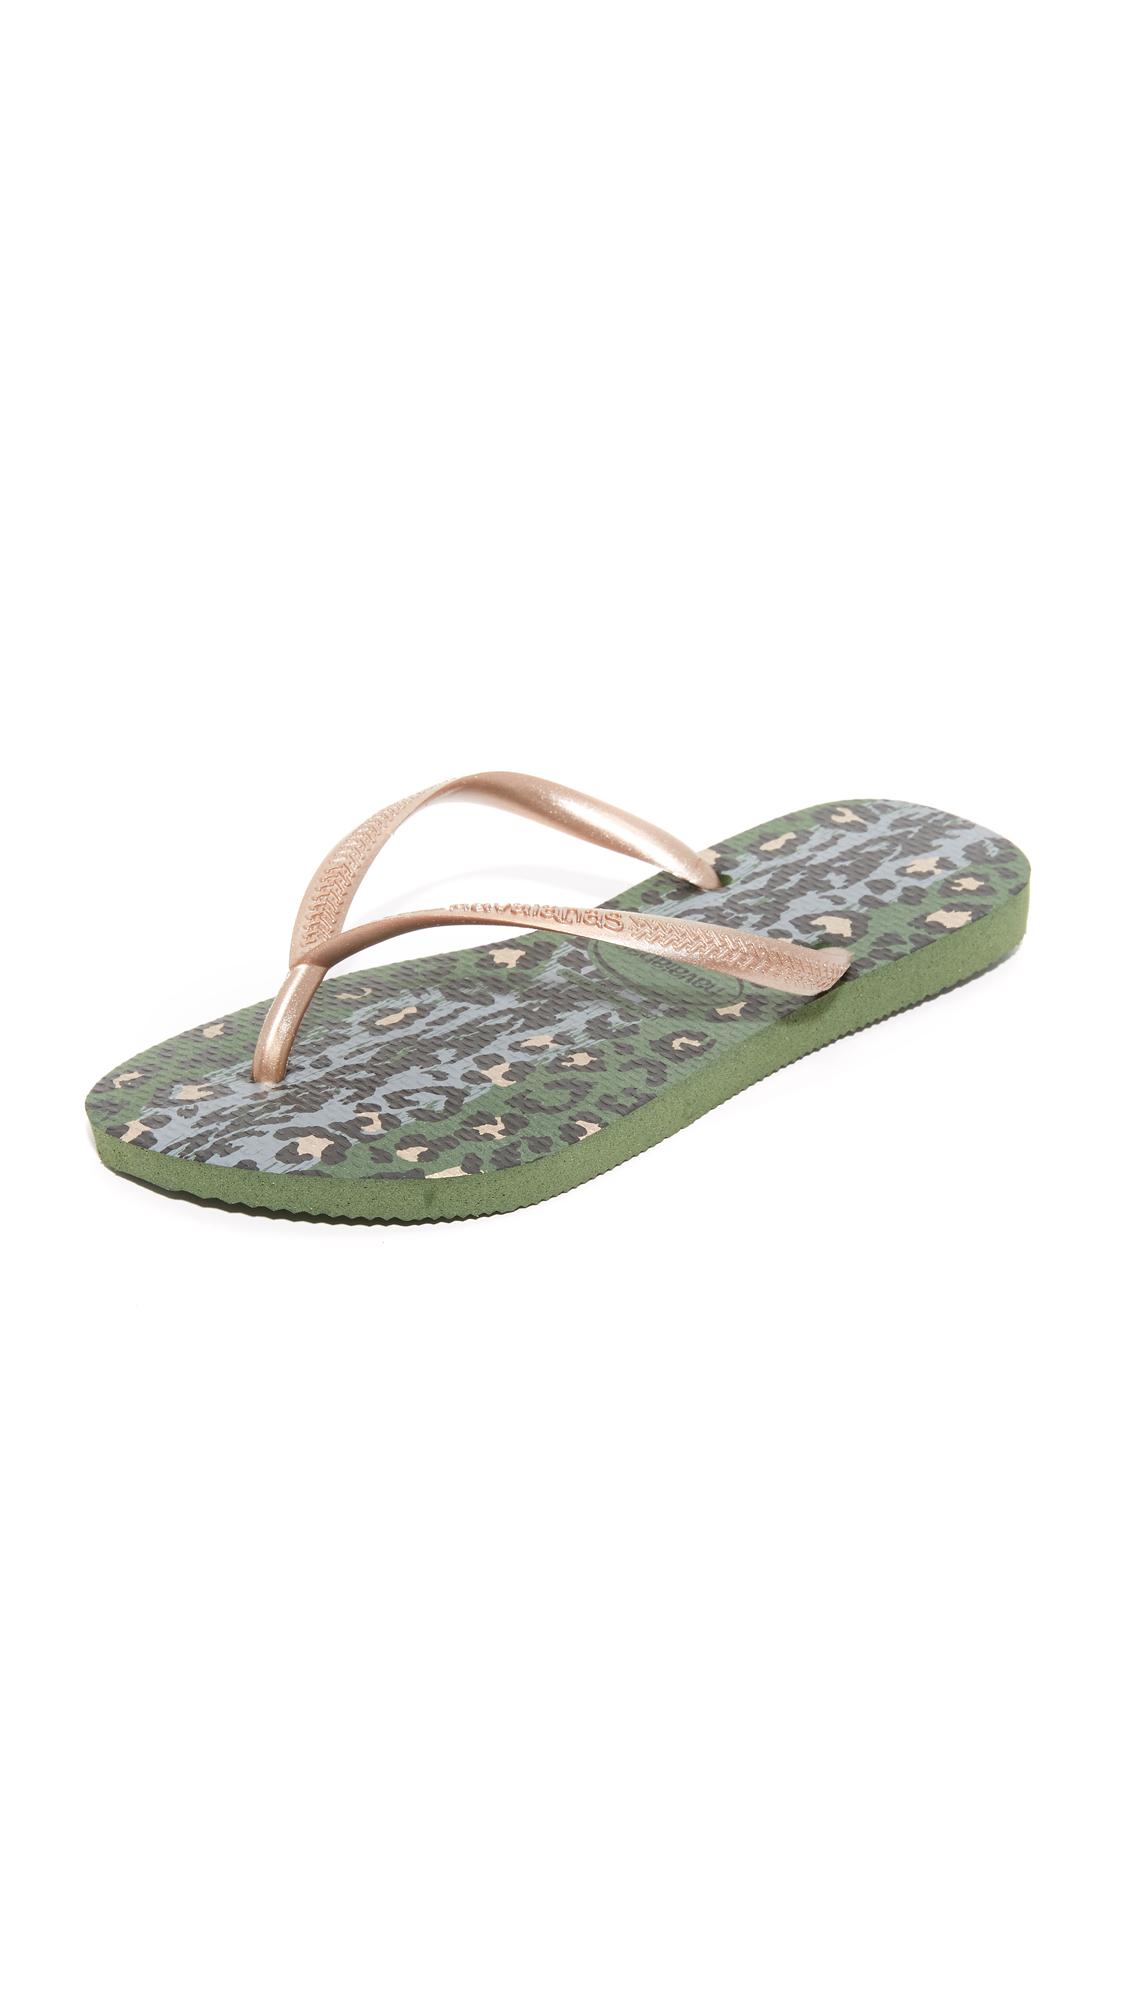 Havaianas Slim Animals Flip Flops - Green Olive at Shopbop